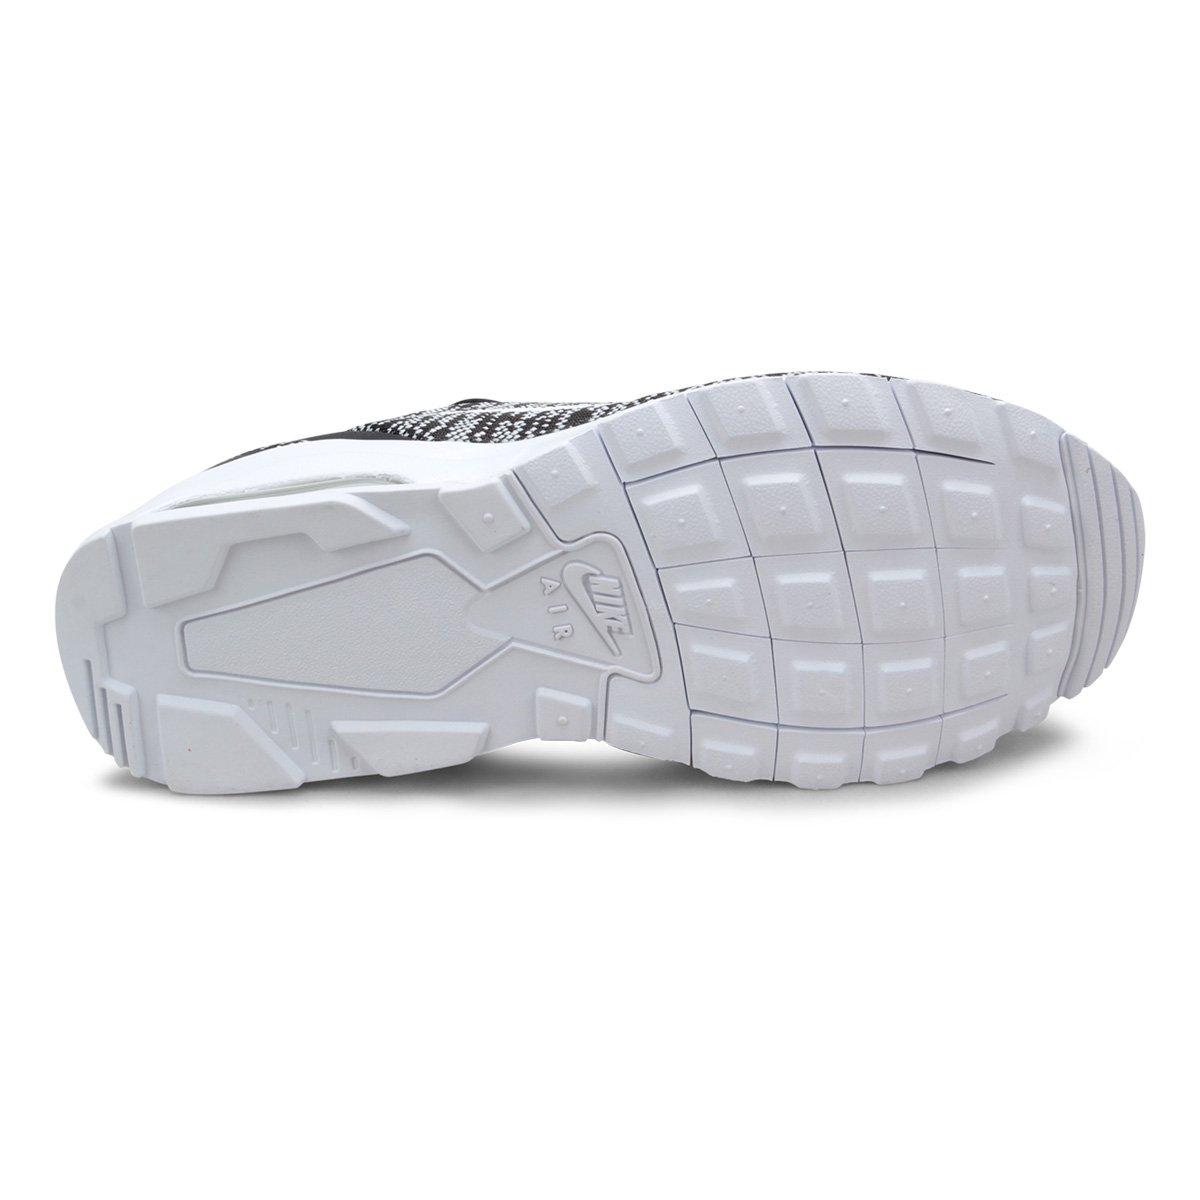 Tênis Nike Air Max Motion Racer Masculino - Branco e Preto - Compre ... 546c3c815c7da